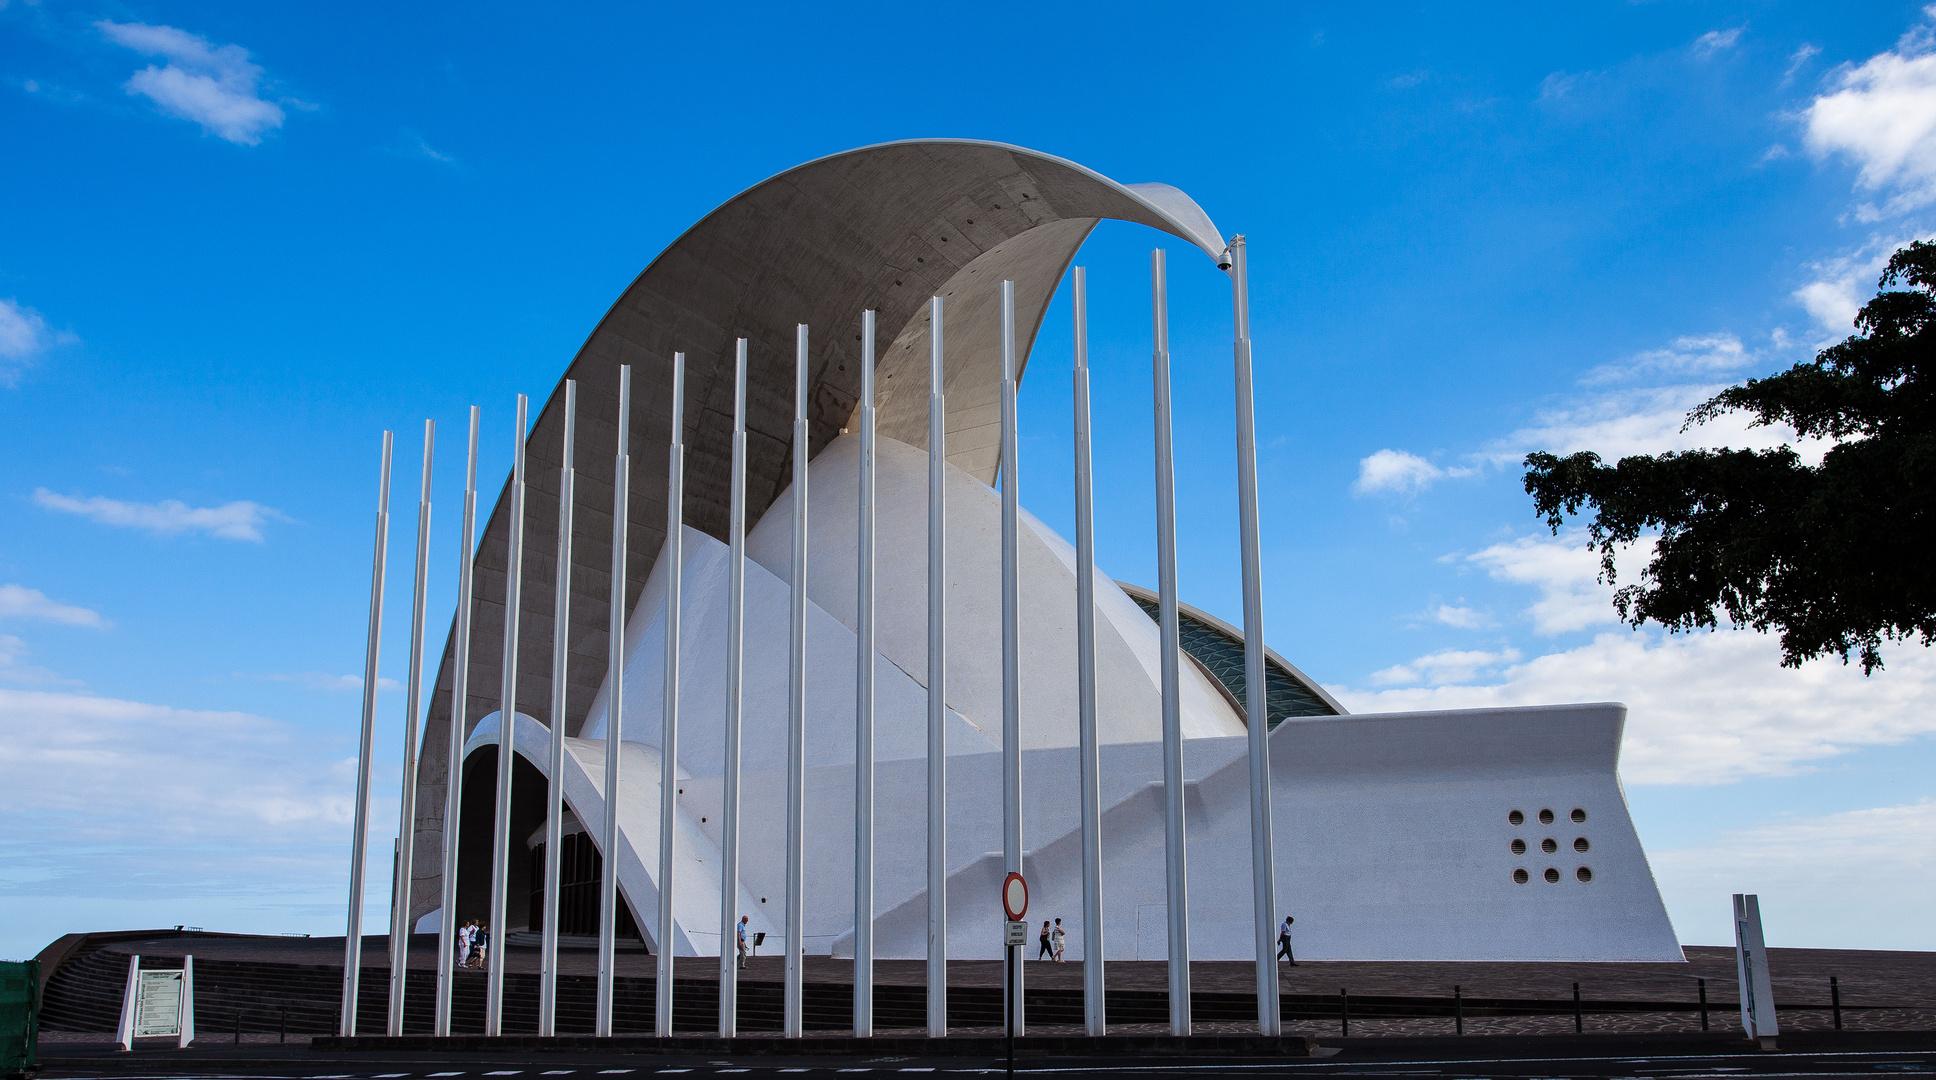 Auditorio - Santiago Calatrava